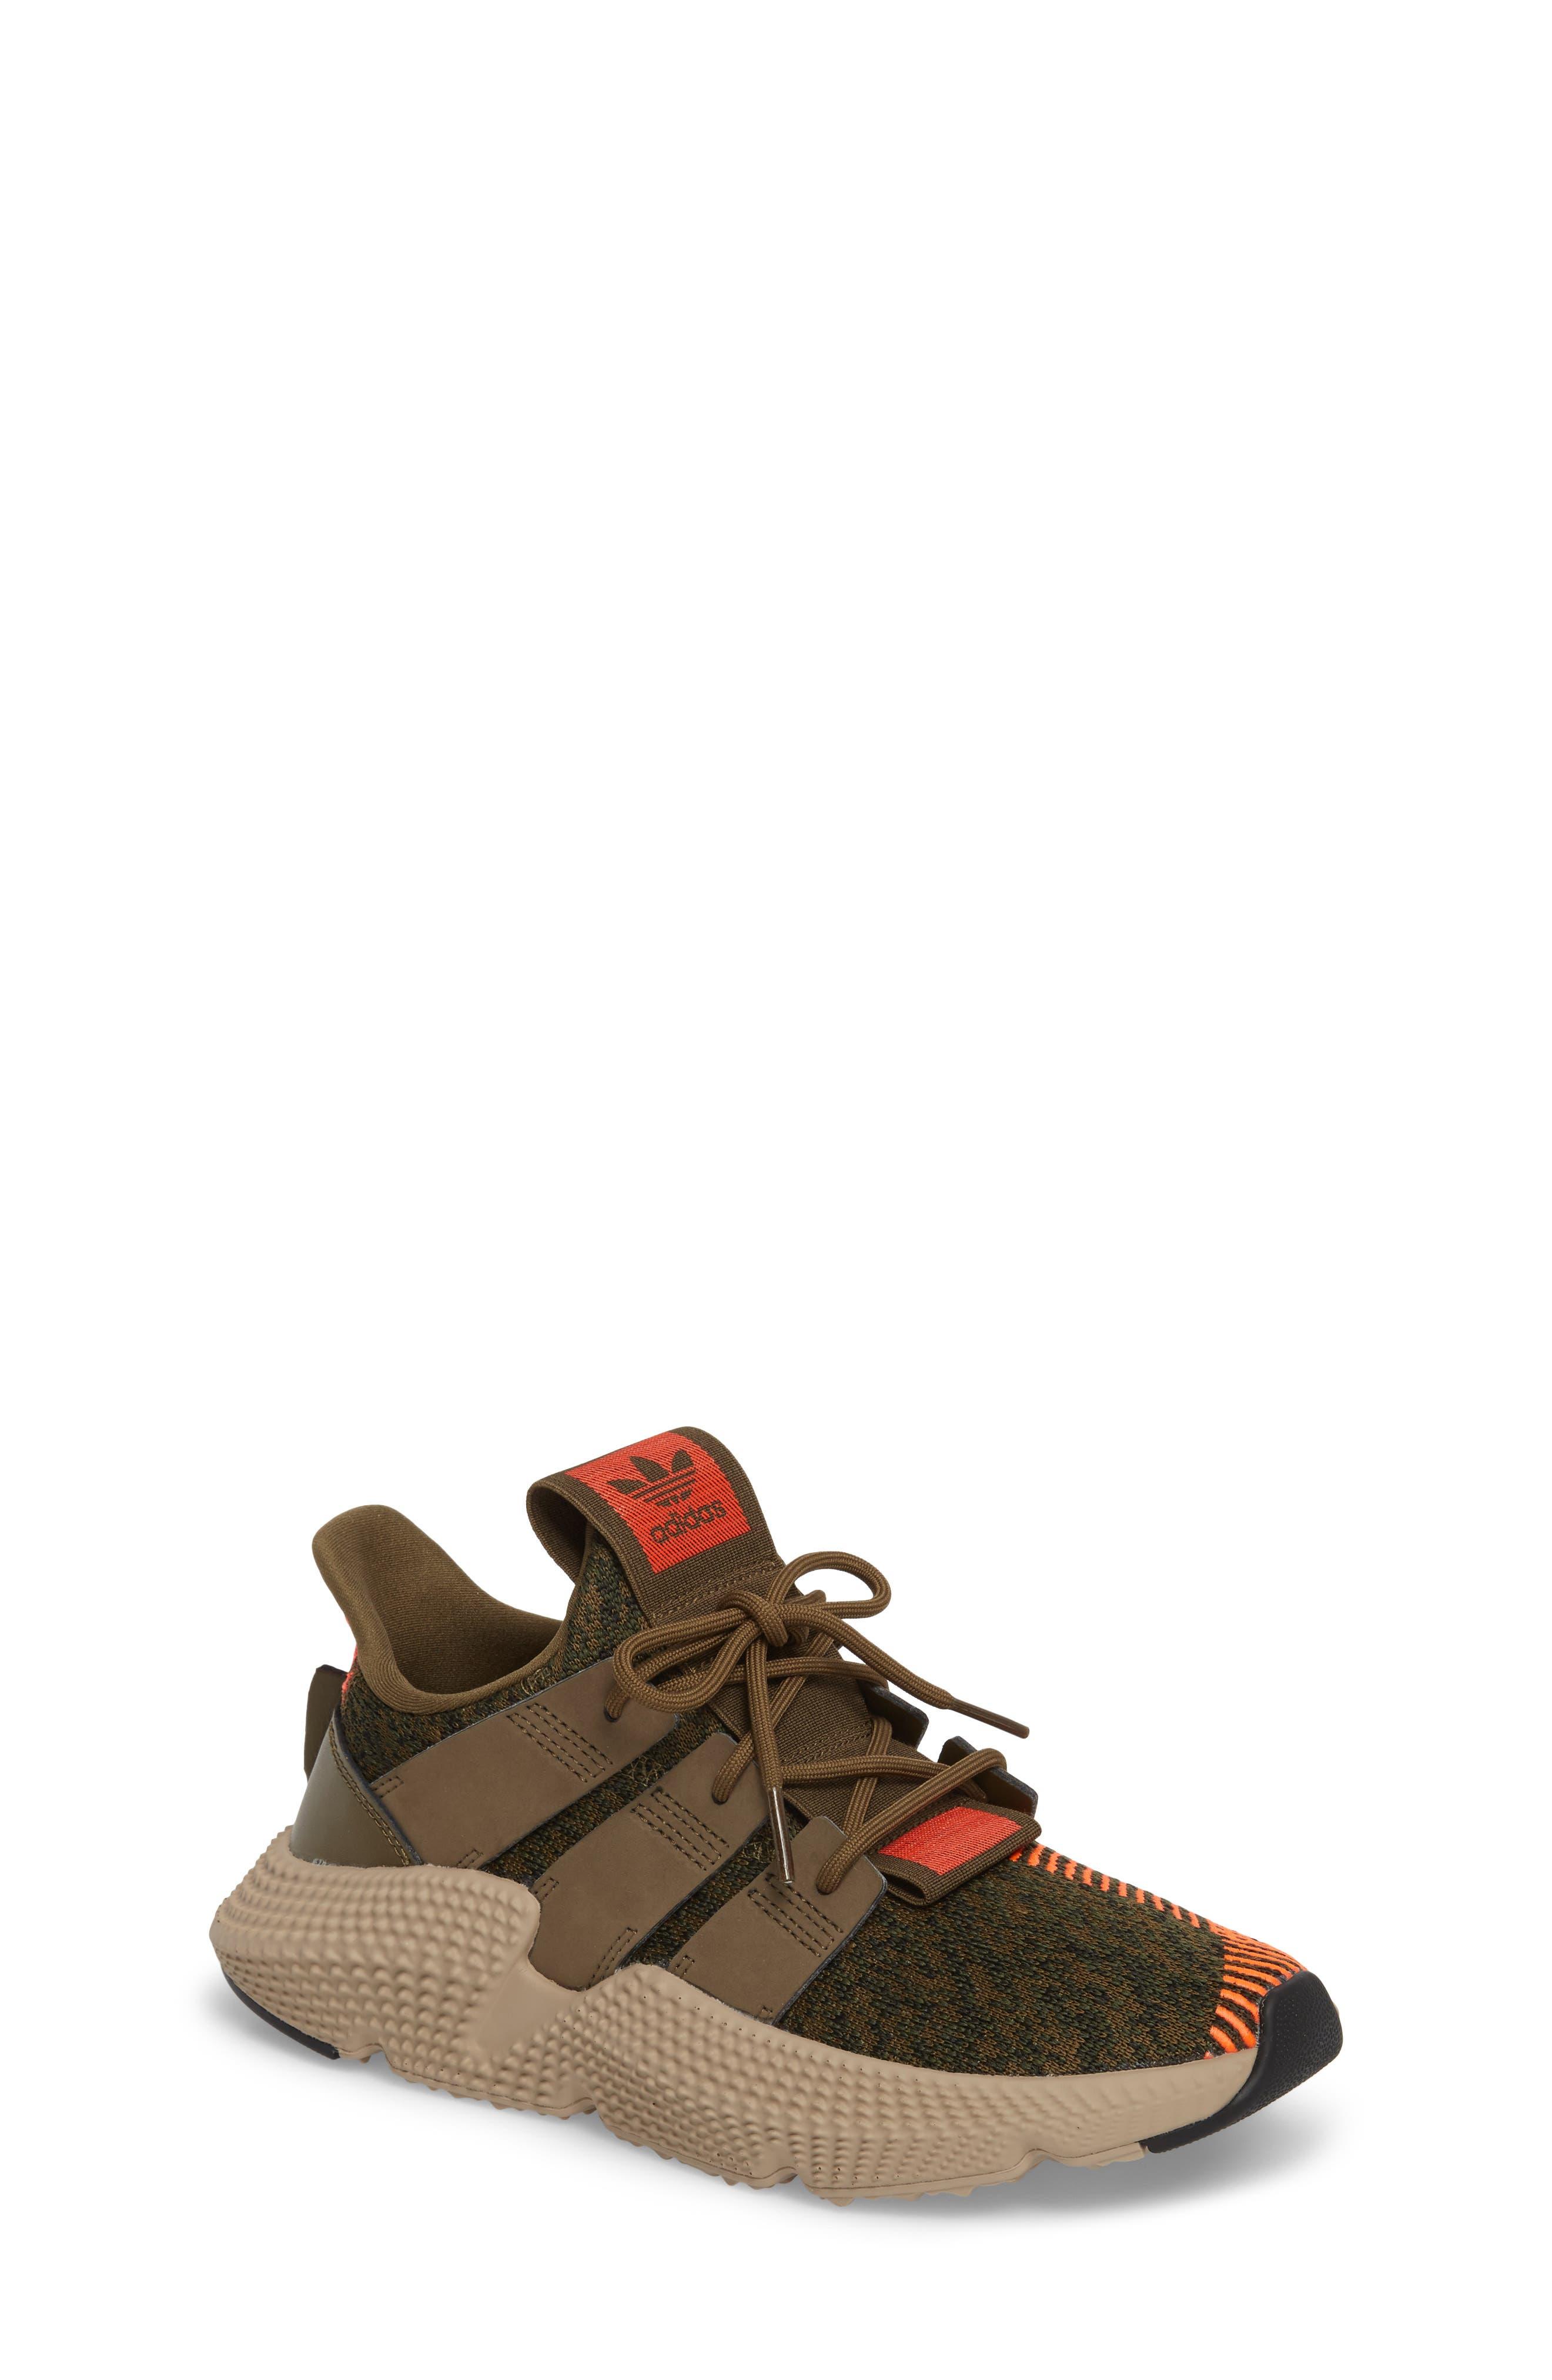 Prophere Sneaker,                         Main,                         color, Trace Olive / Trace Khaki